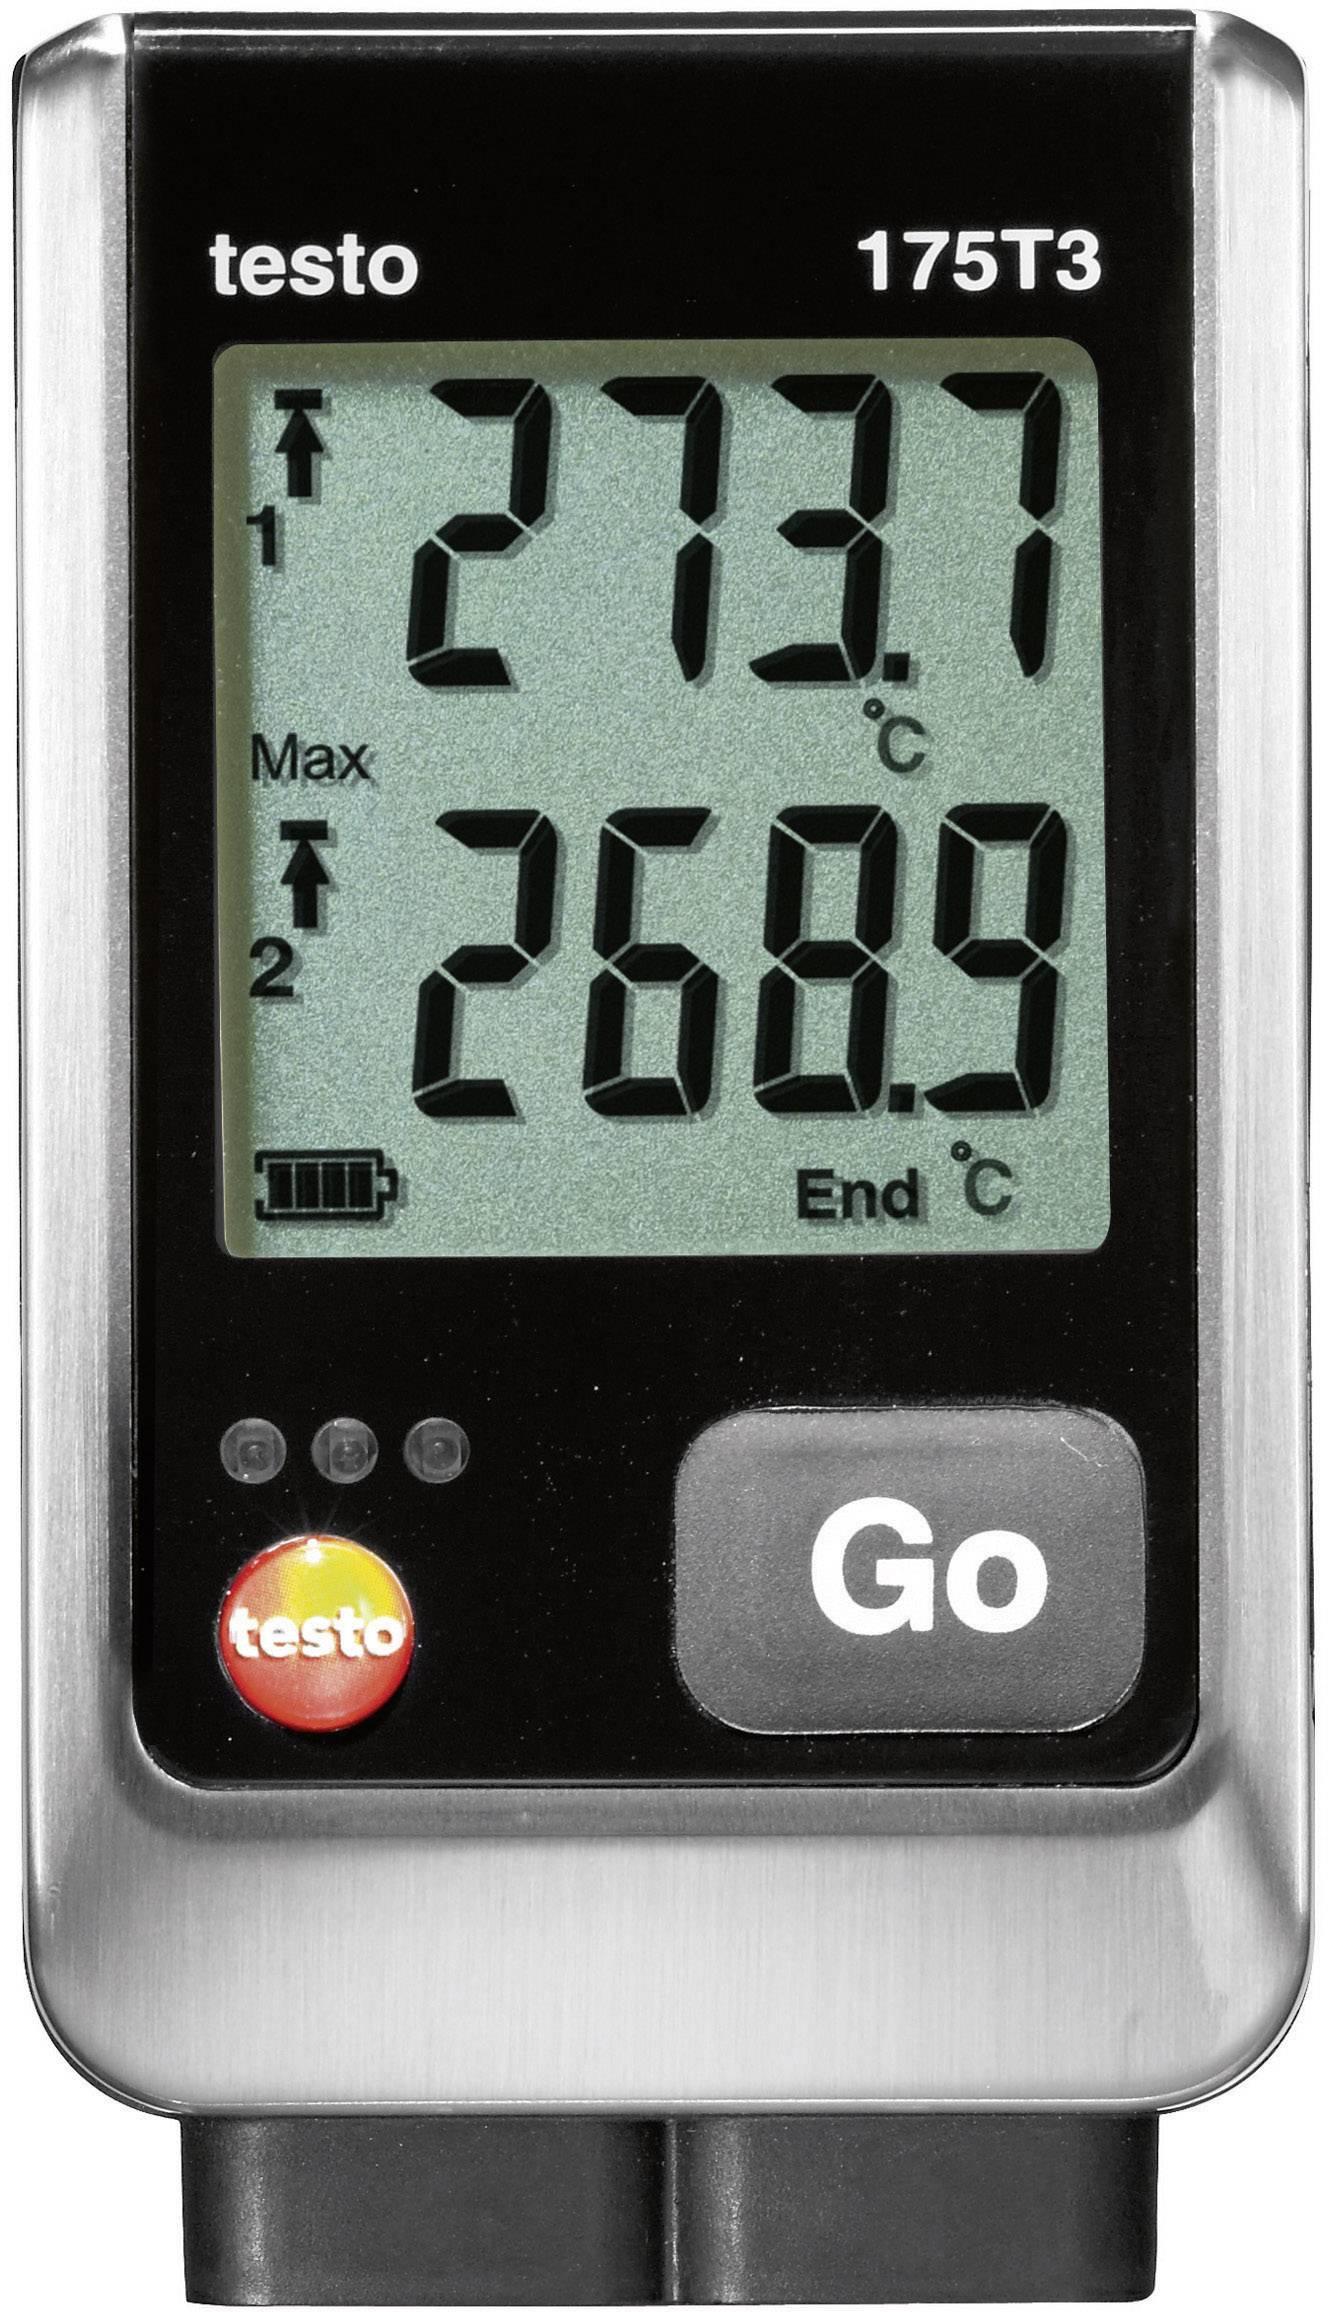 Teplotný datalogger testo 175 T3, -50 až +400 °C Typ T, -50 až +1000 °C Typ K